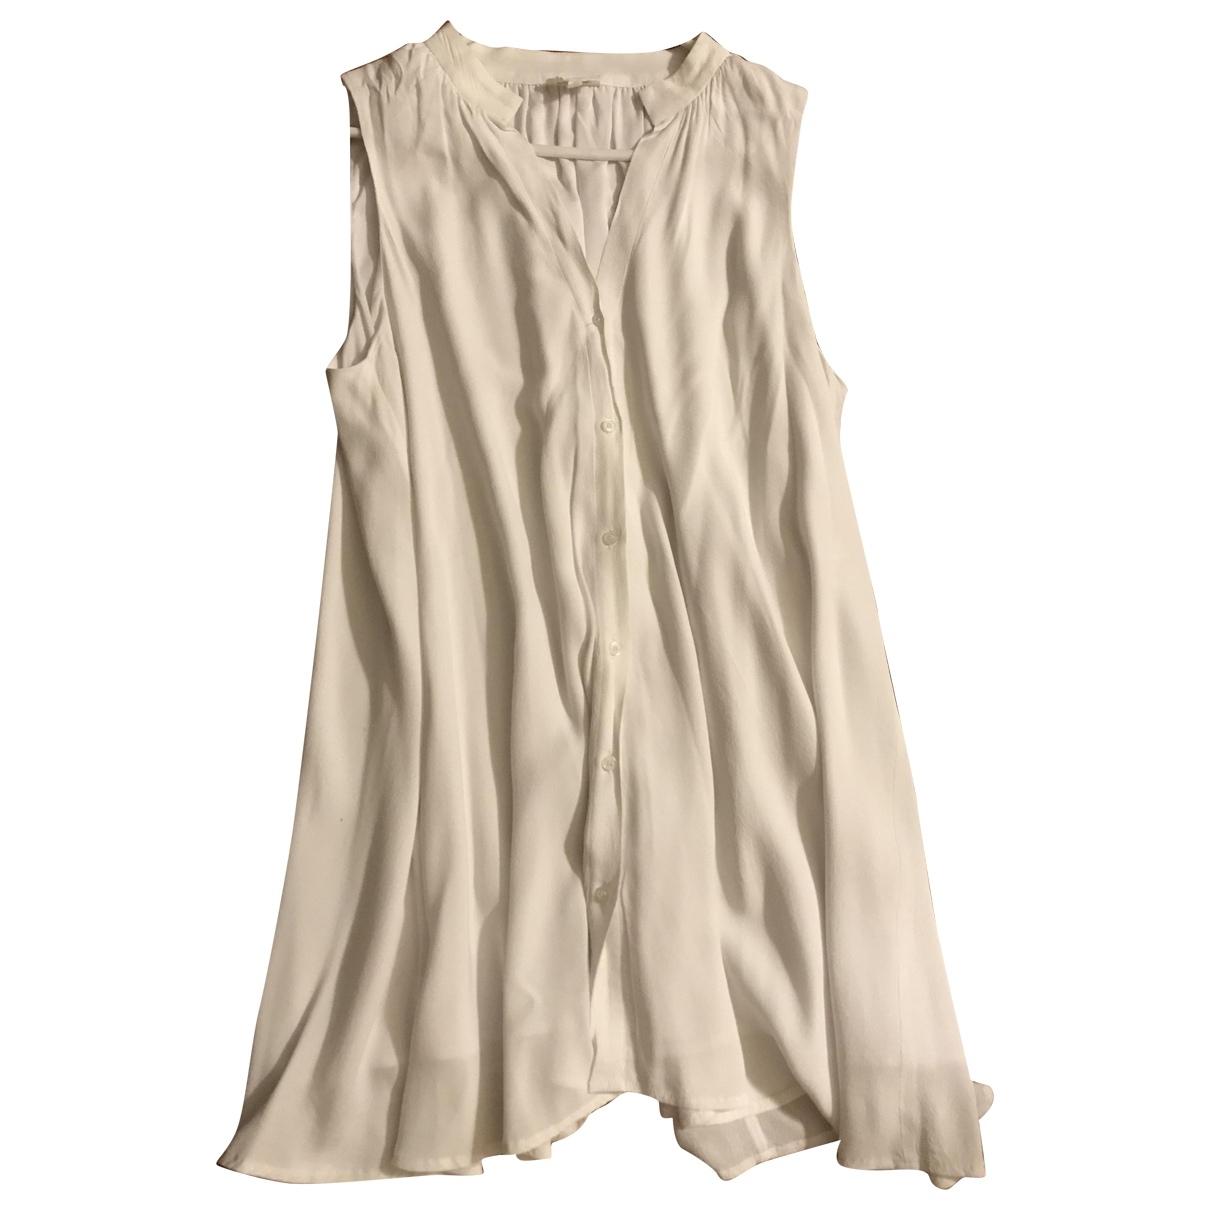 Bel Air \N White dress for Women One Size International